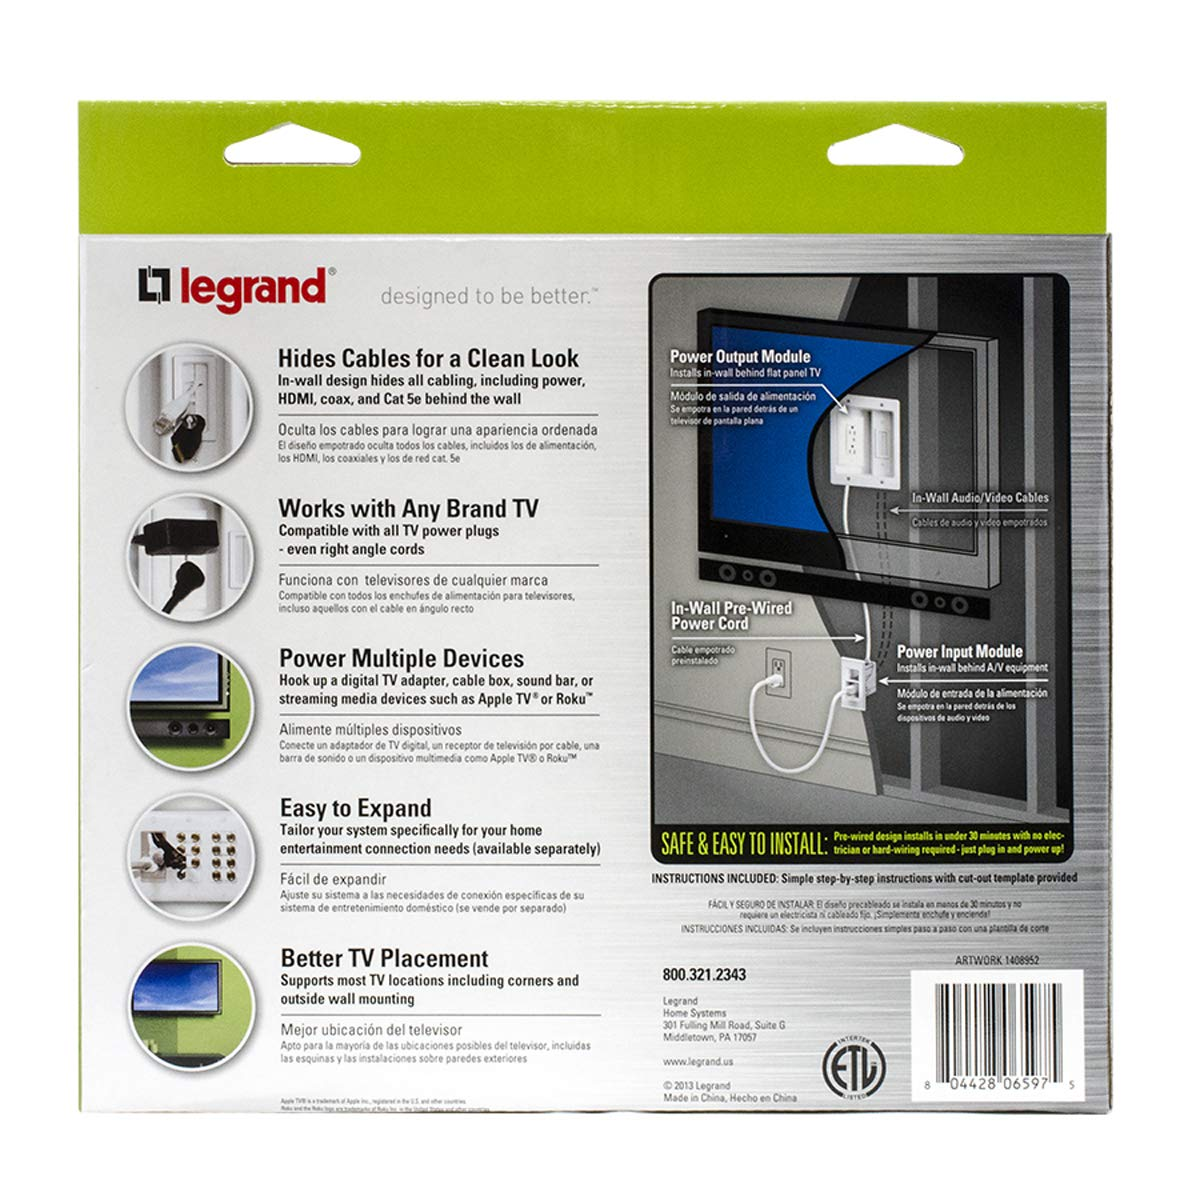 amazon com on q legrand ht2202whv1 inwall tv power kit home rh amazon com